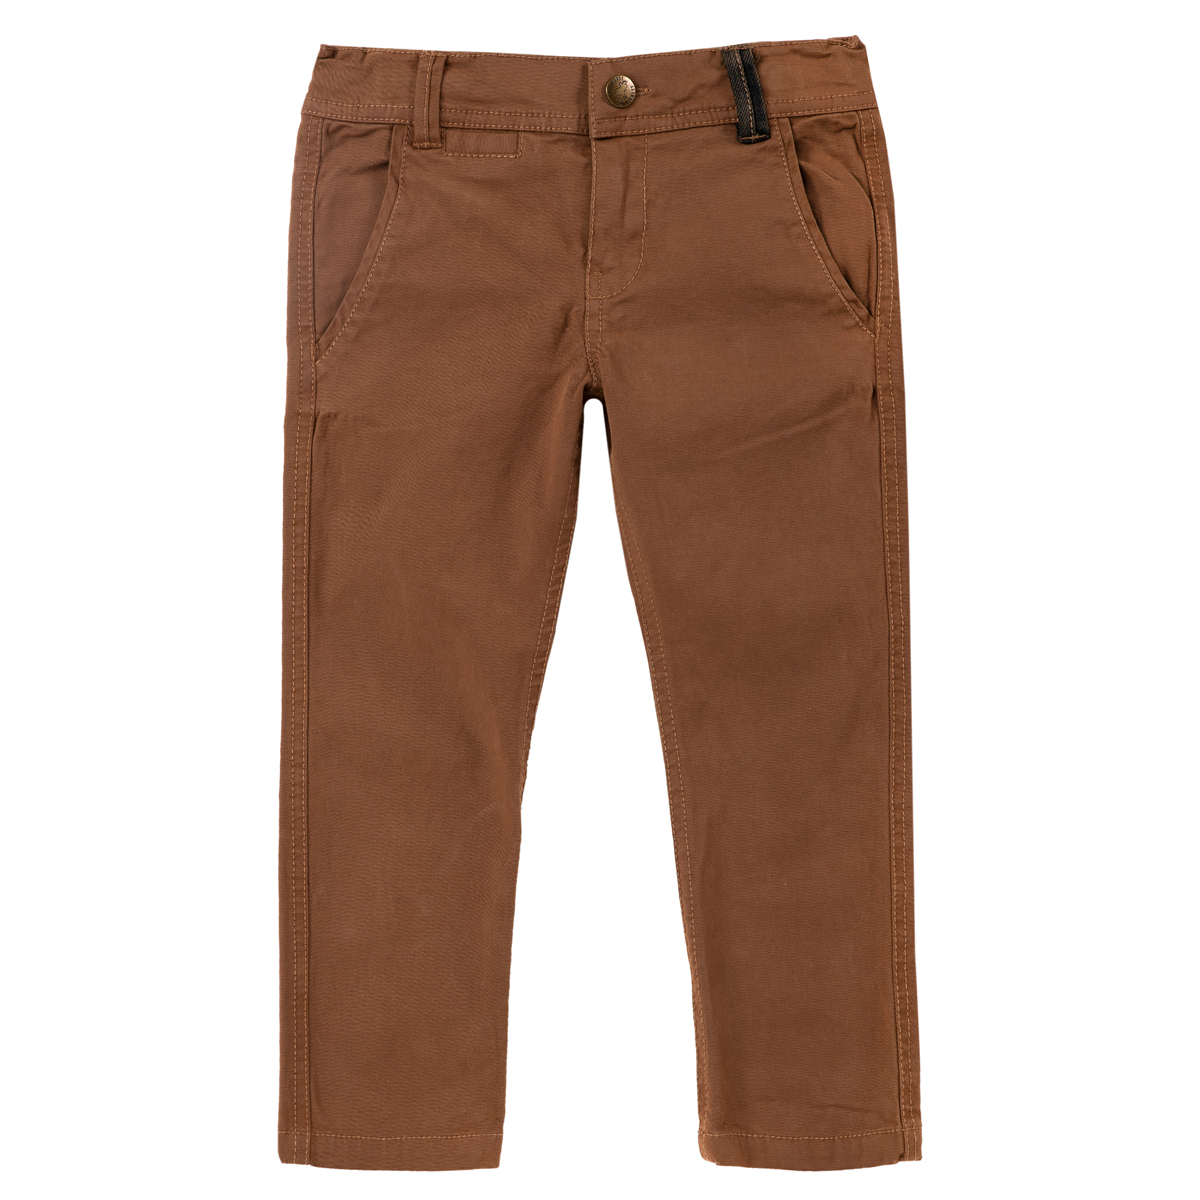 Pantaloni lungi copii Chicco, maro, 08024 din categoria Pantaloni copii